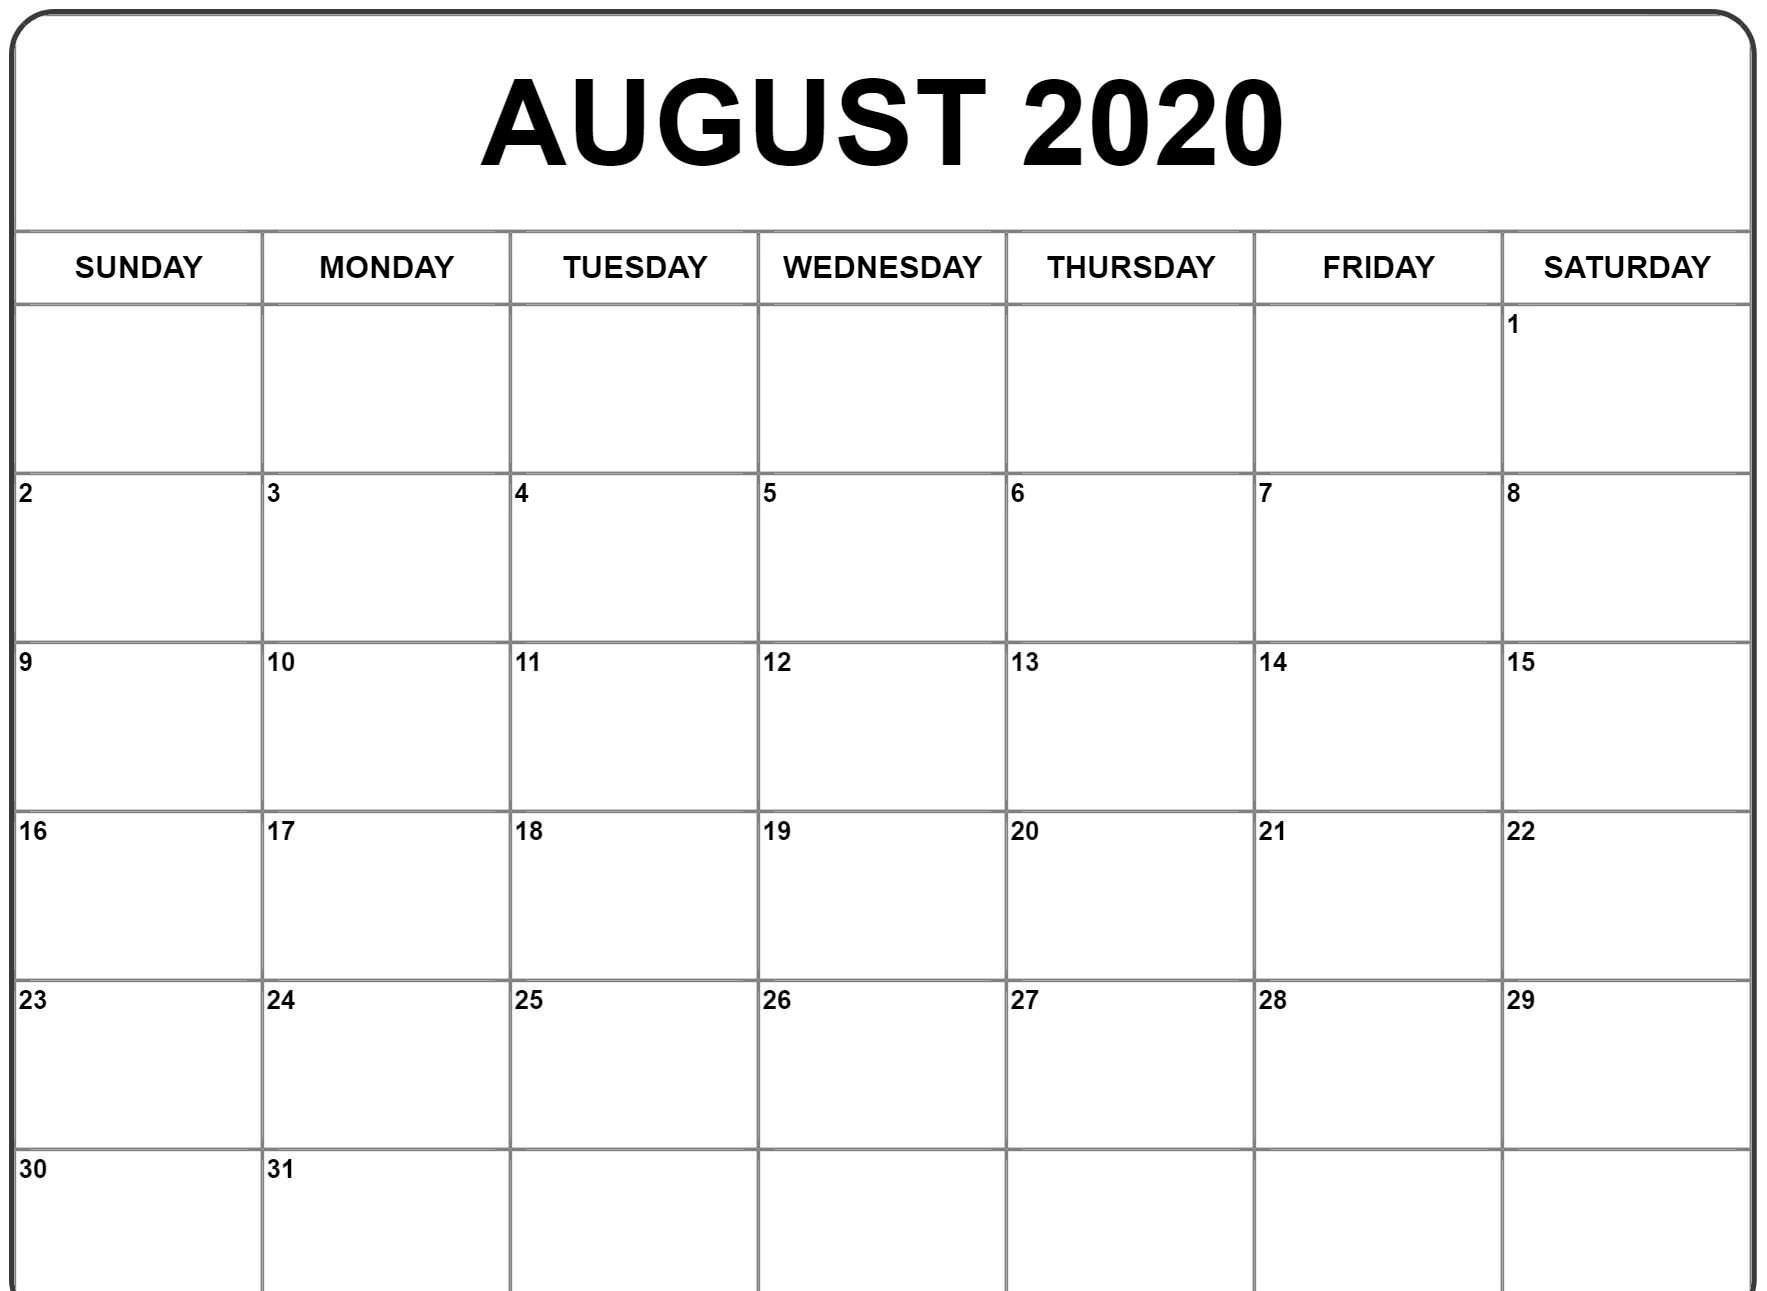 August 2020 Calendar Template In 2020 Calendar Template 2020 Calendar Template Free Printable Calendar Templates